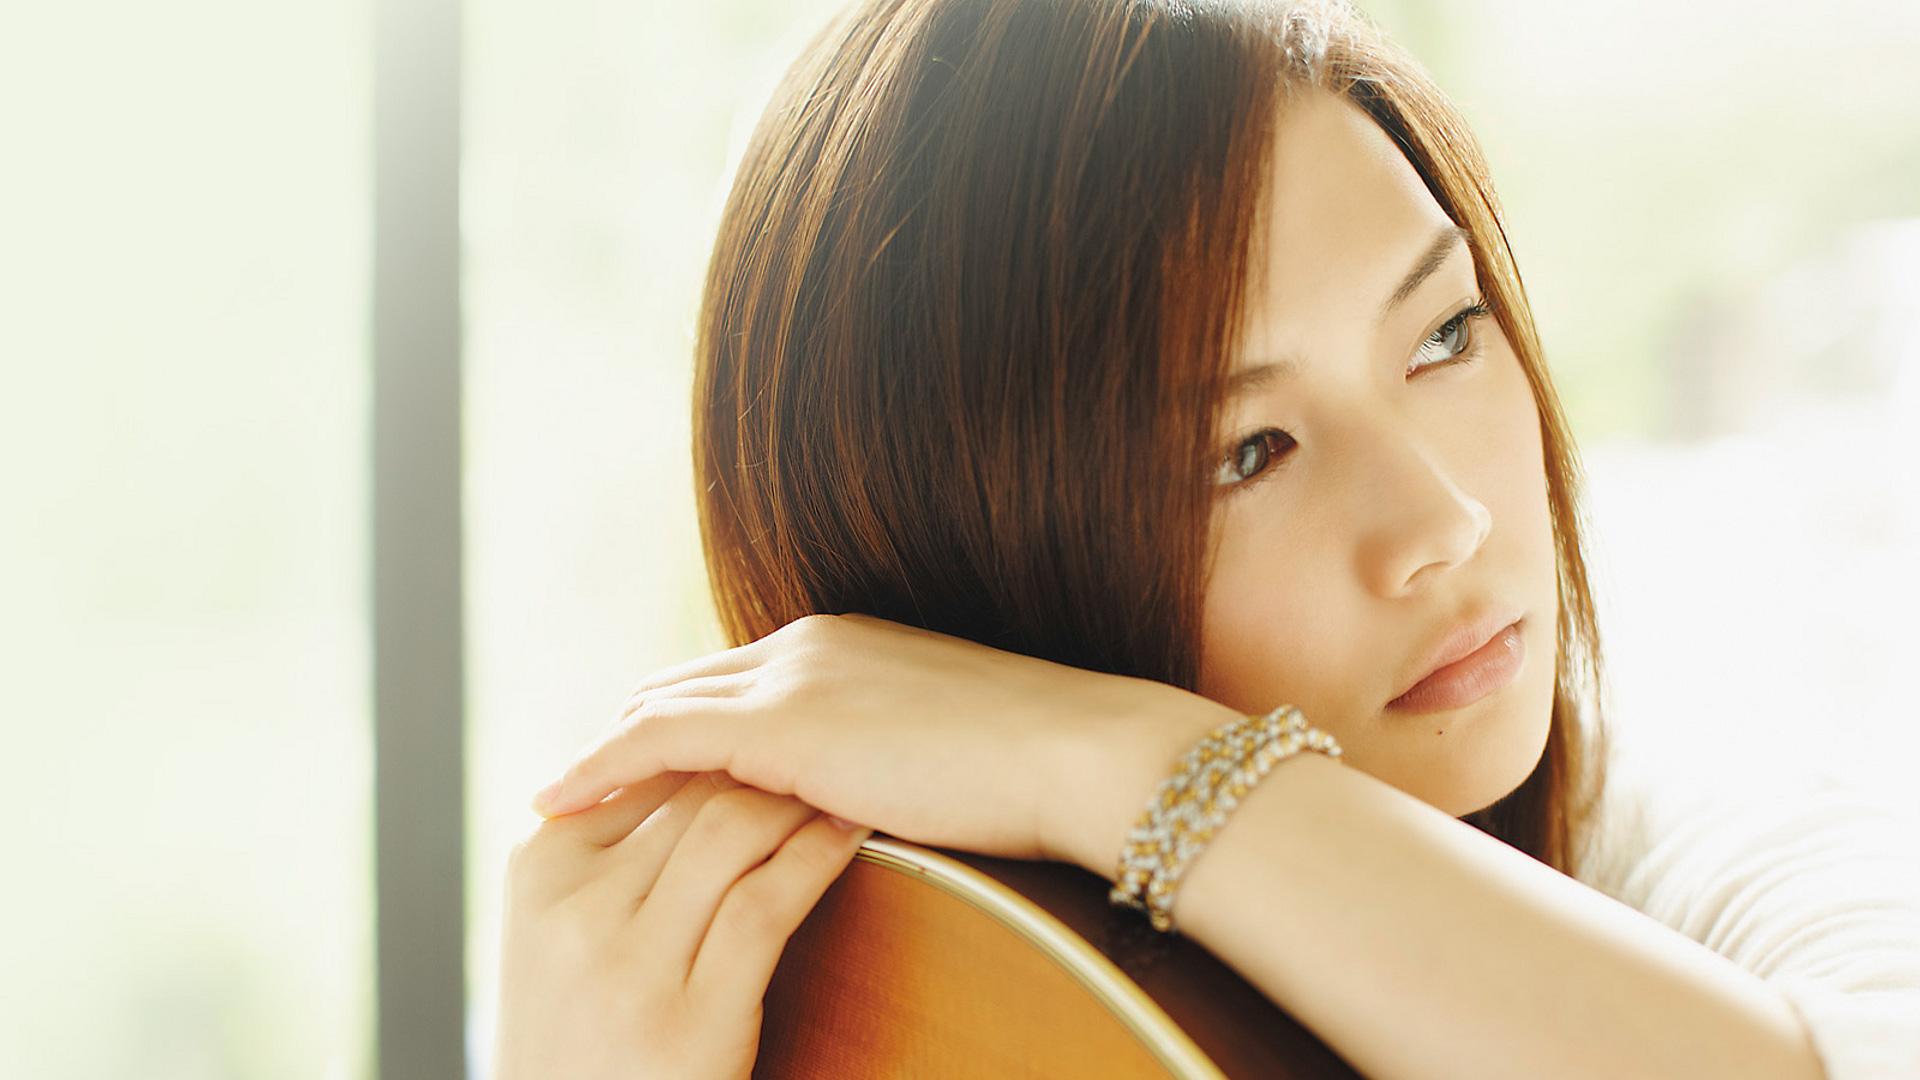 nara chan no sekai agustus 2012